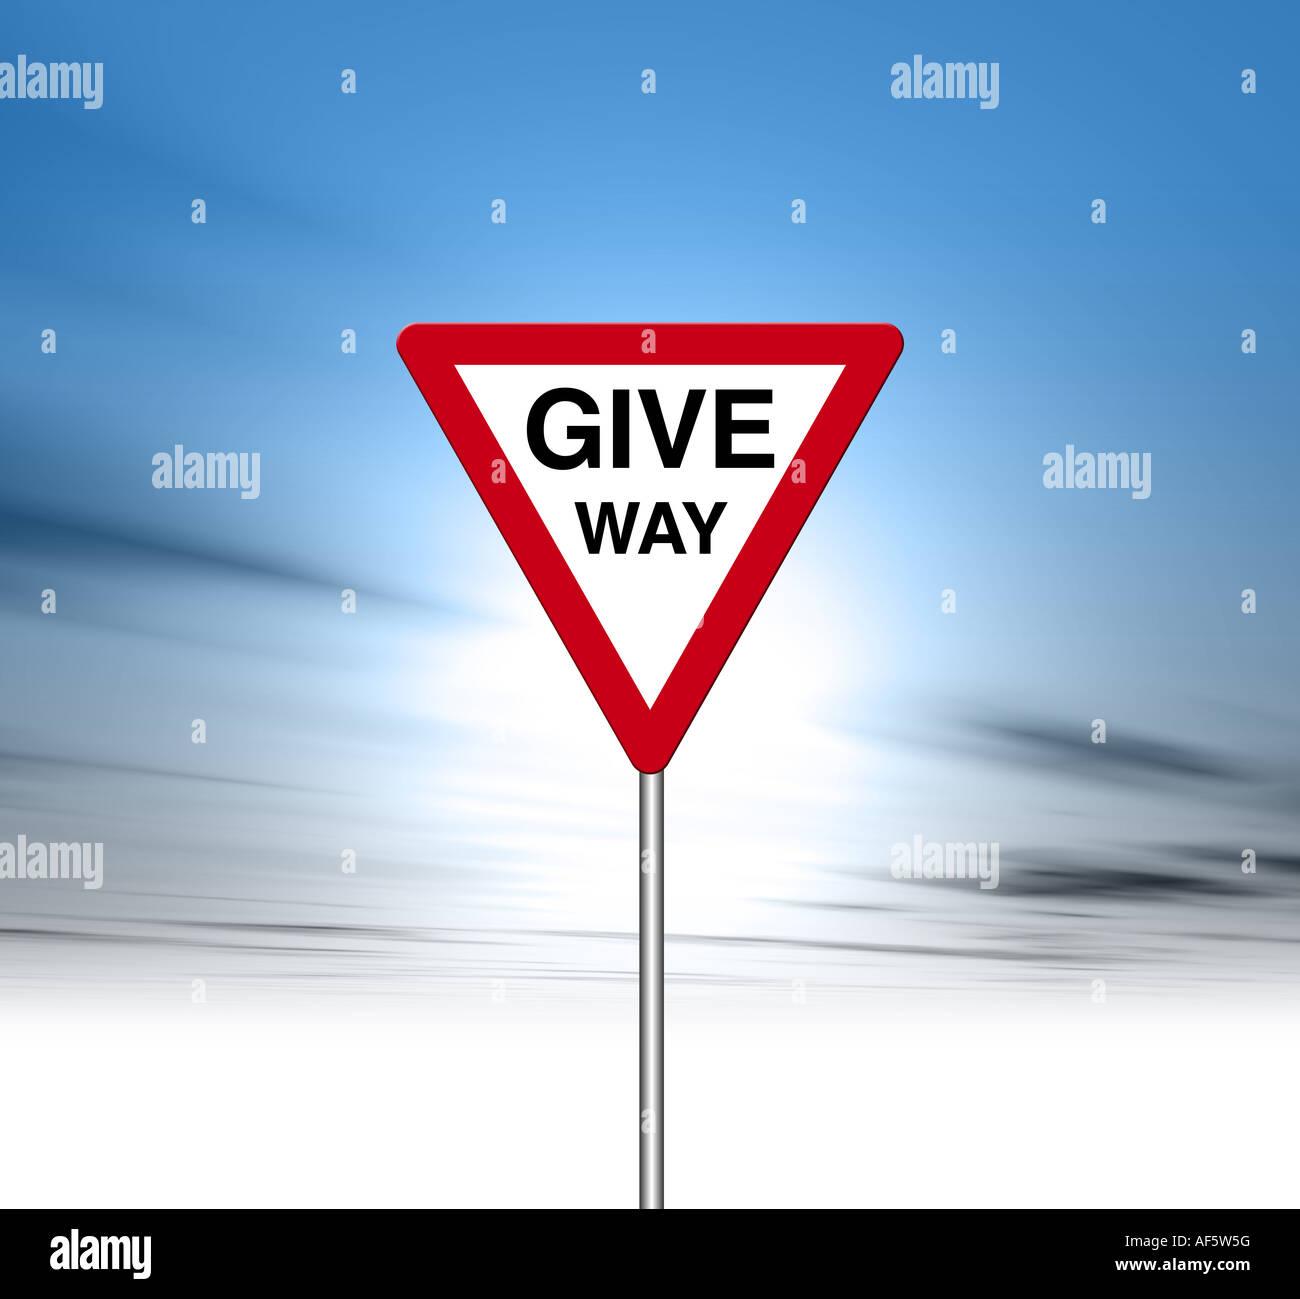 Give way Road sign digital illustration Stock Photo